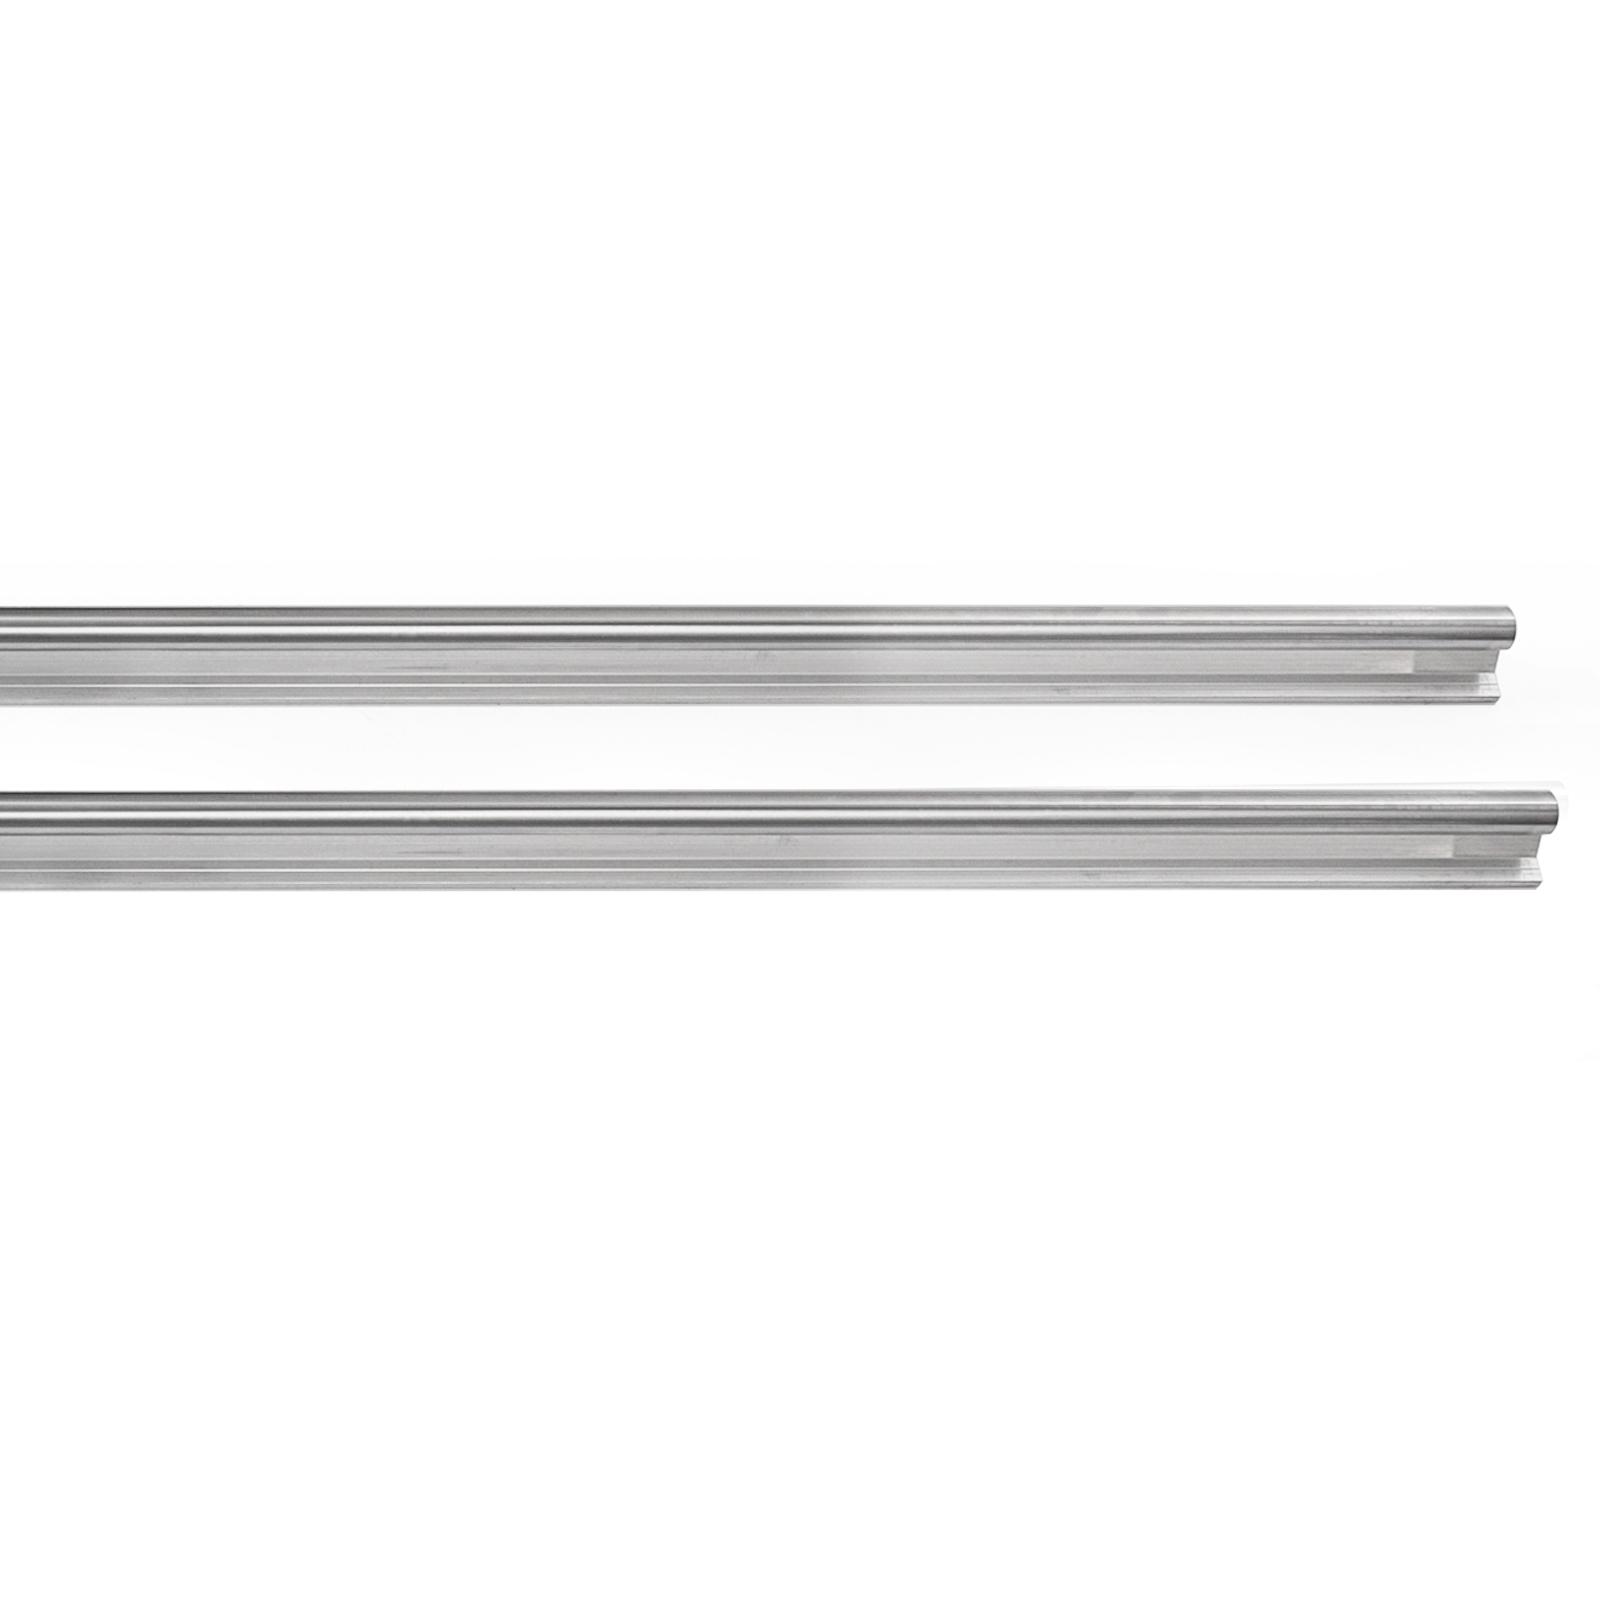 2Pcs-SBR20-1200mm-Linear-Slide-Guide-Shaft-Rail-4Pcs-SBR20UU-Bearing-Block-CNC thumbnail 11